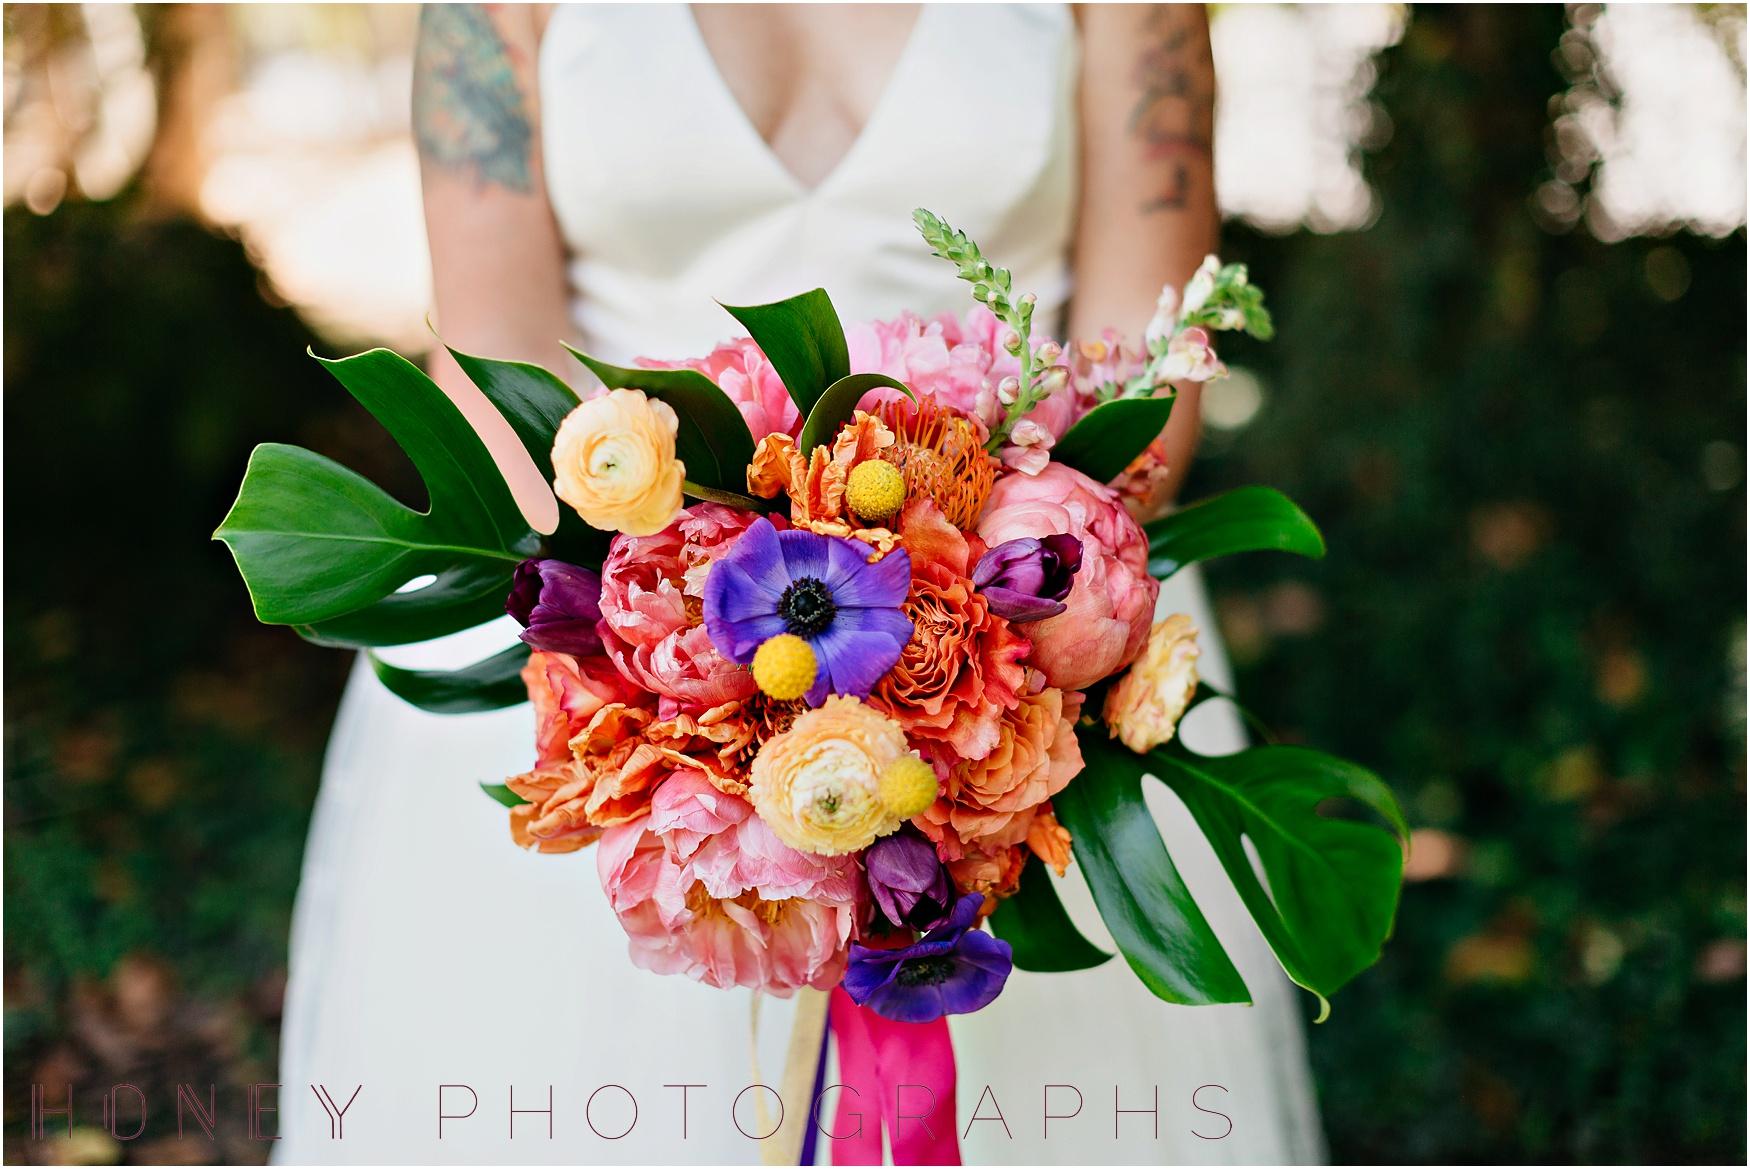 colorful_ecclectic_vibrant_vista_rainbow_quirky_wedding029.jpg